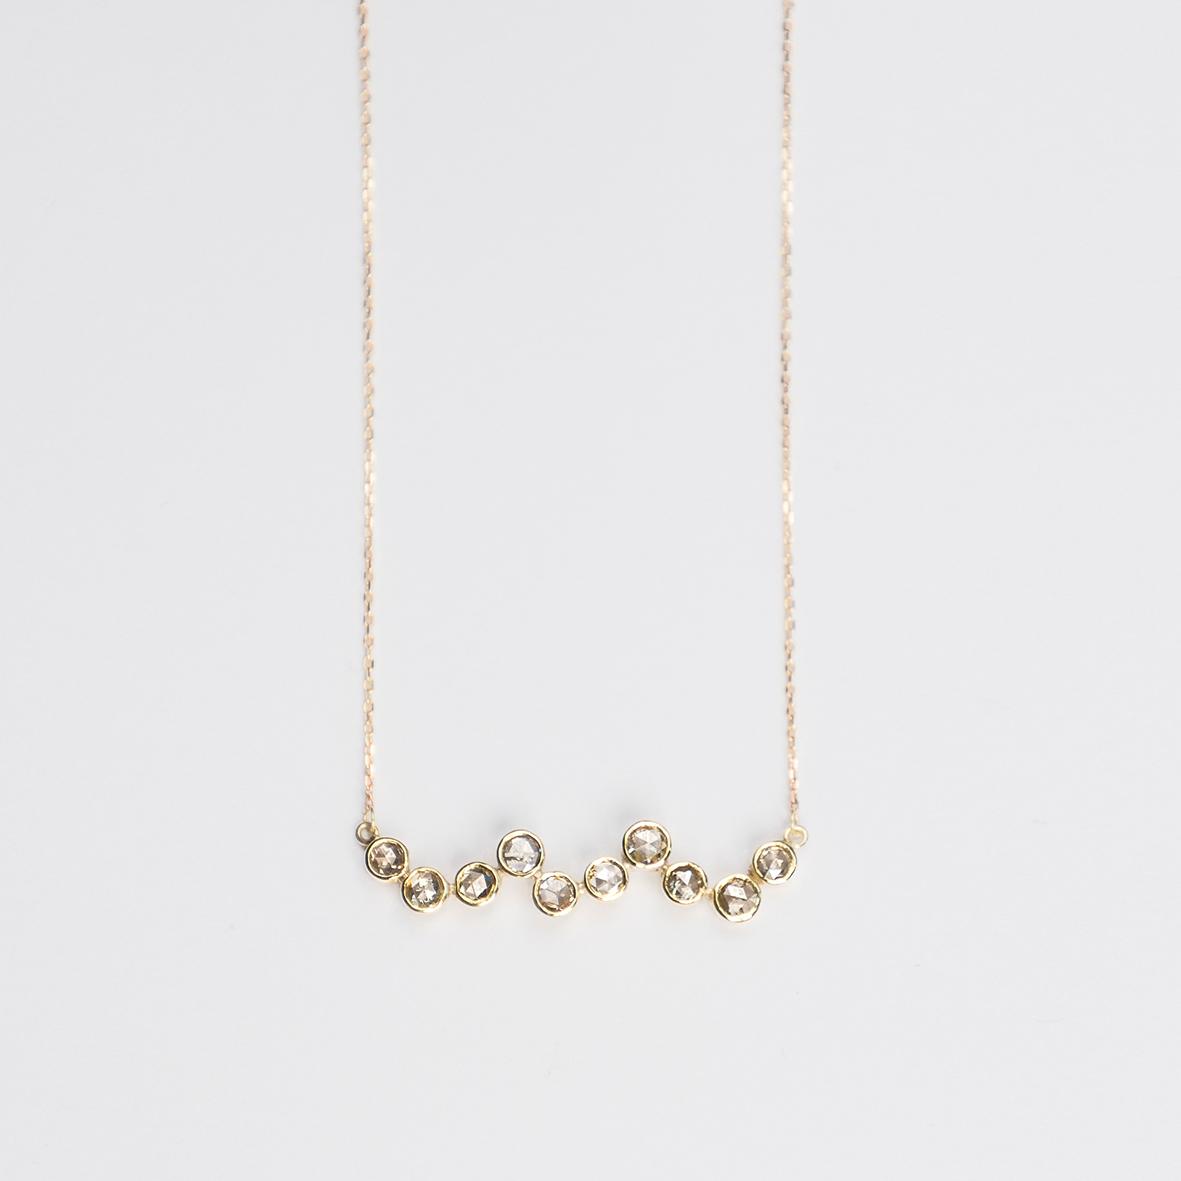 1. OONA_philo_ficha1_waves diamond necklace